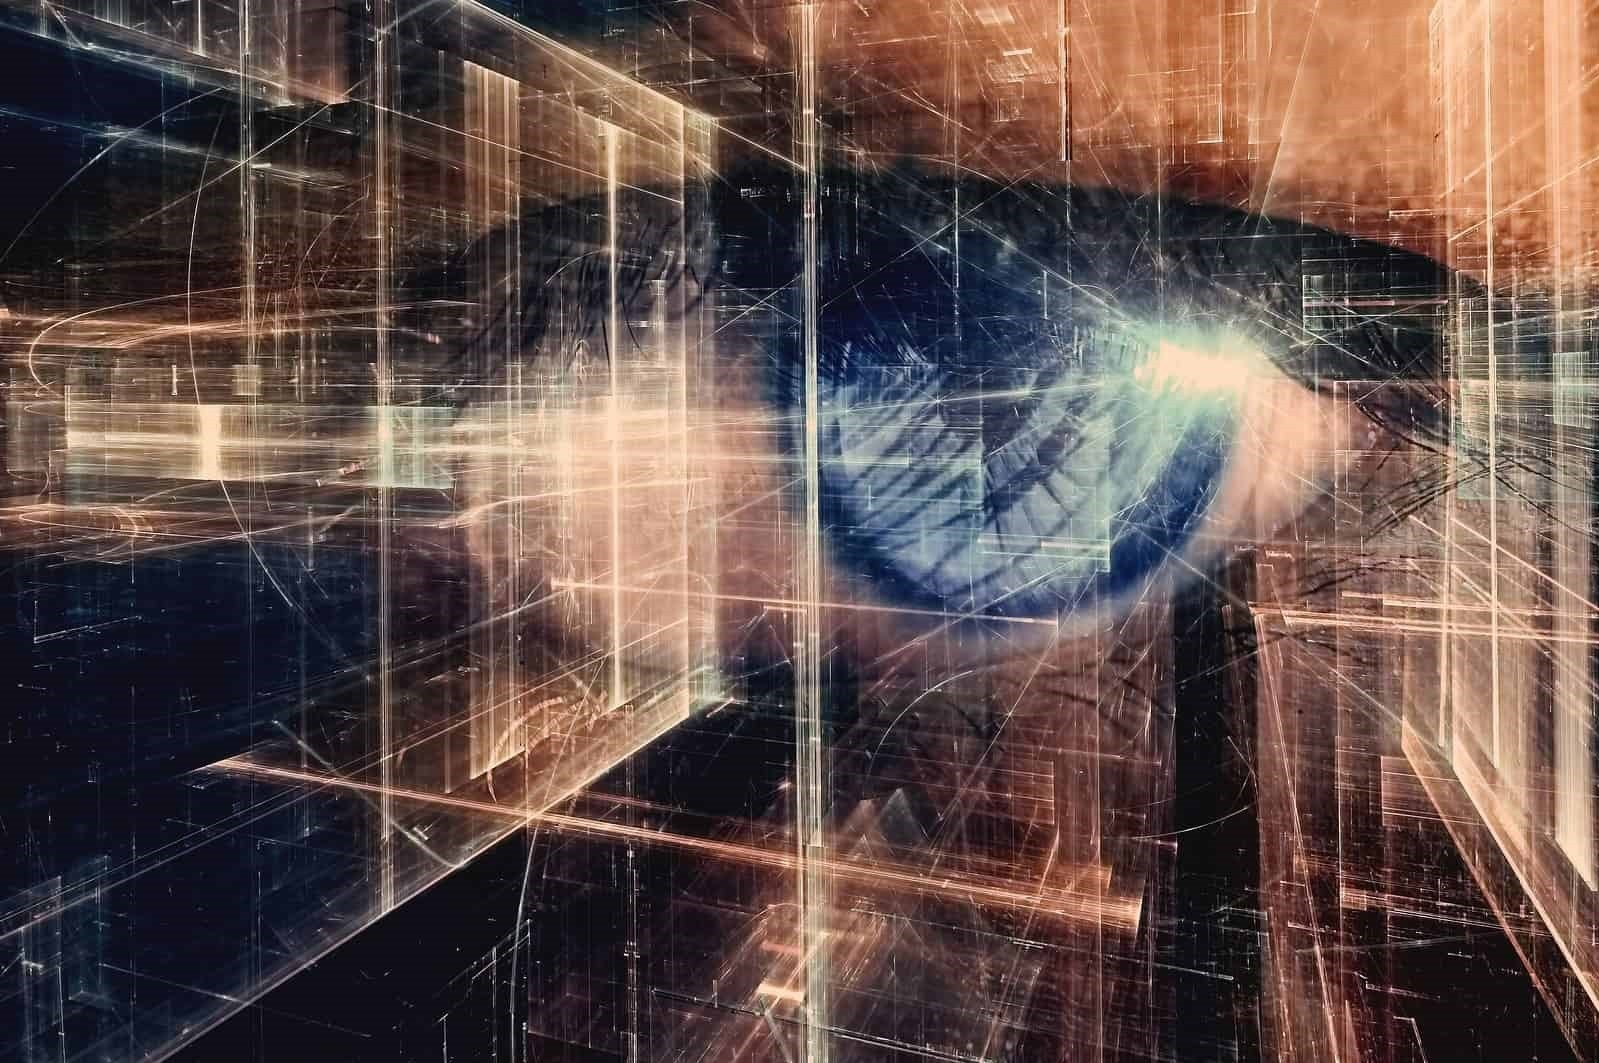 Spiritual Metaphysics: Heart-Based Living